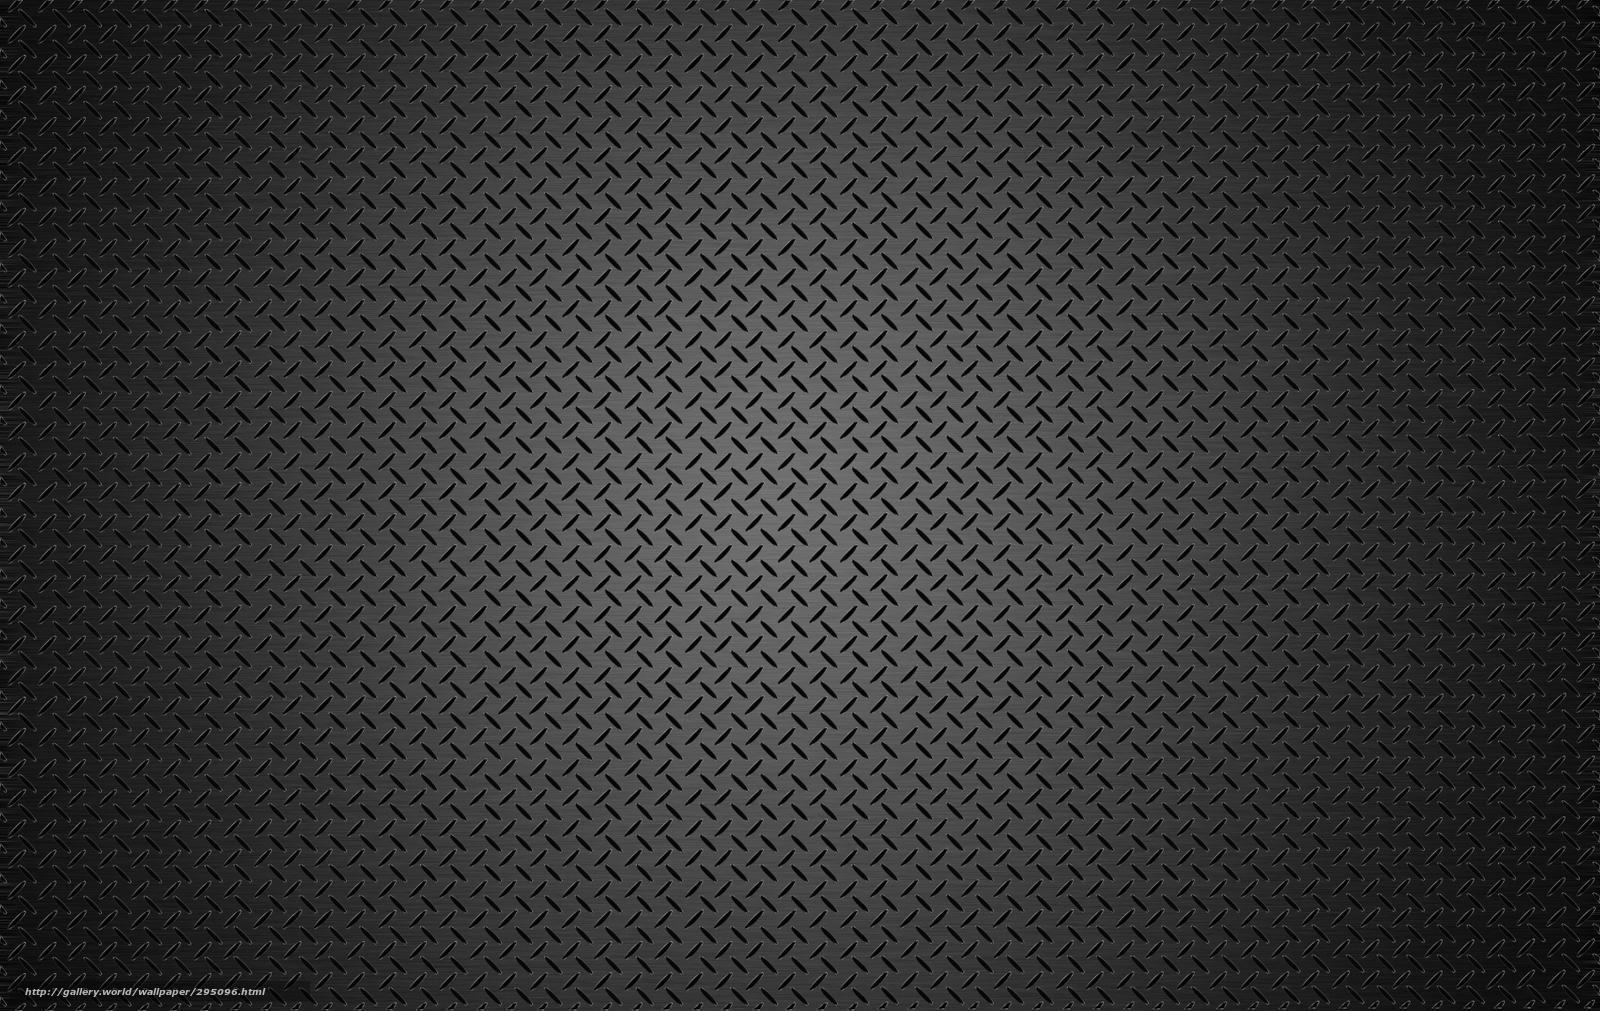 black metal hd wallpaper